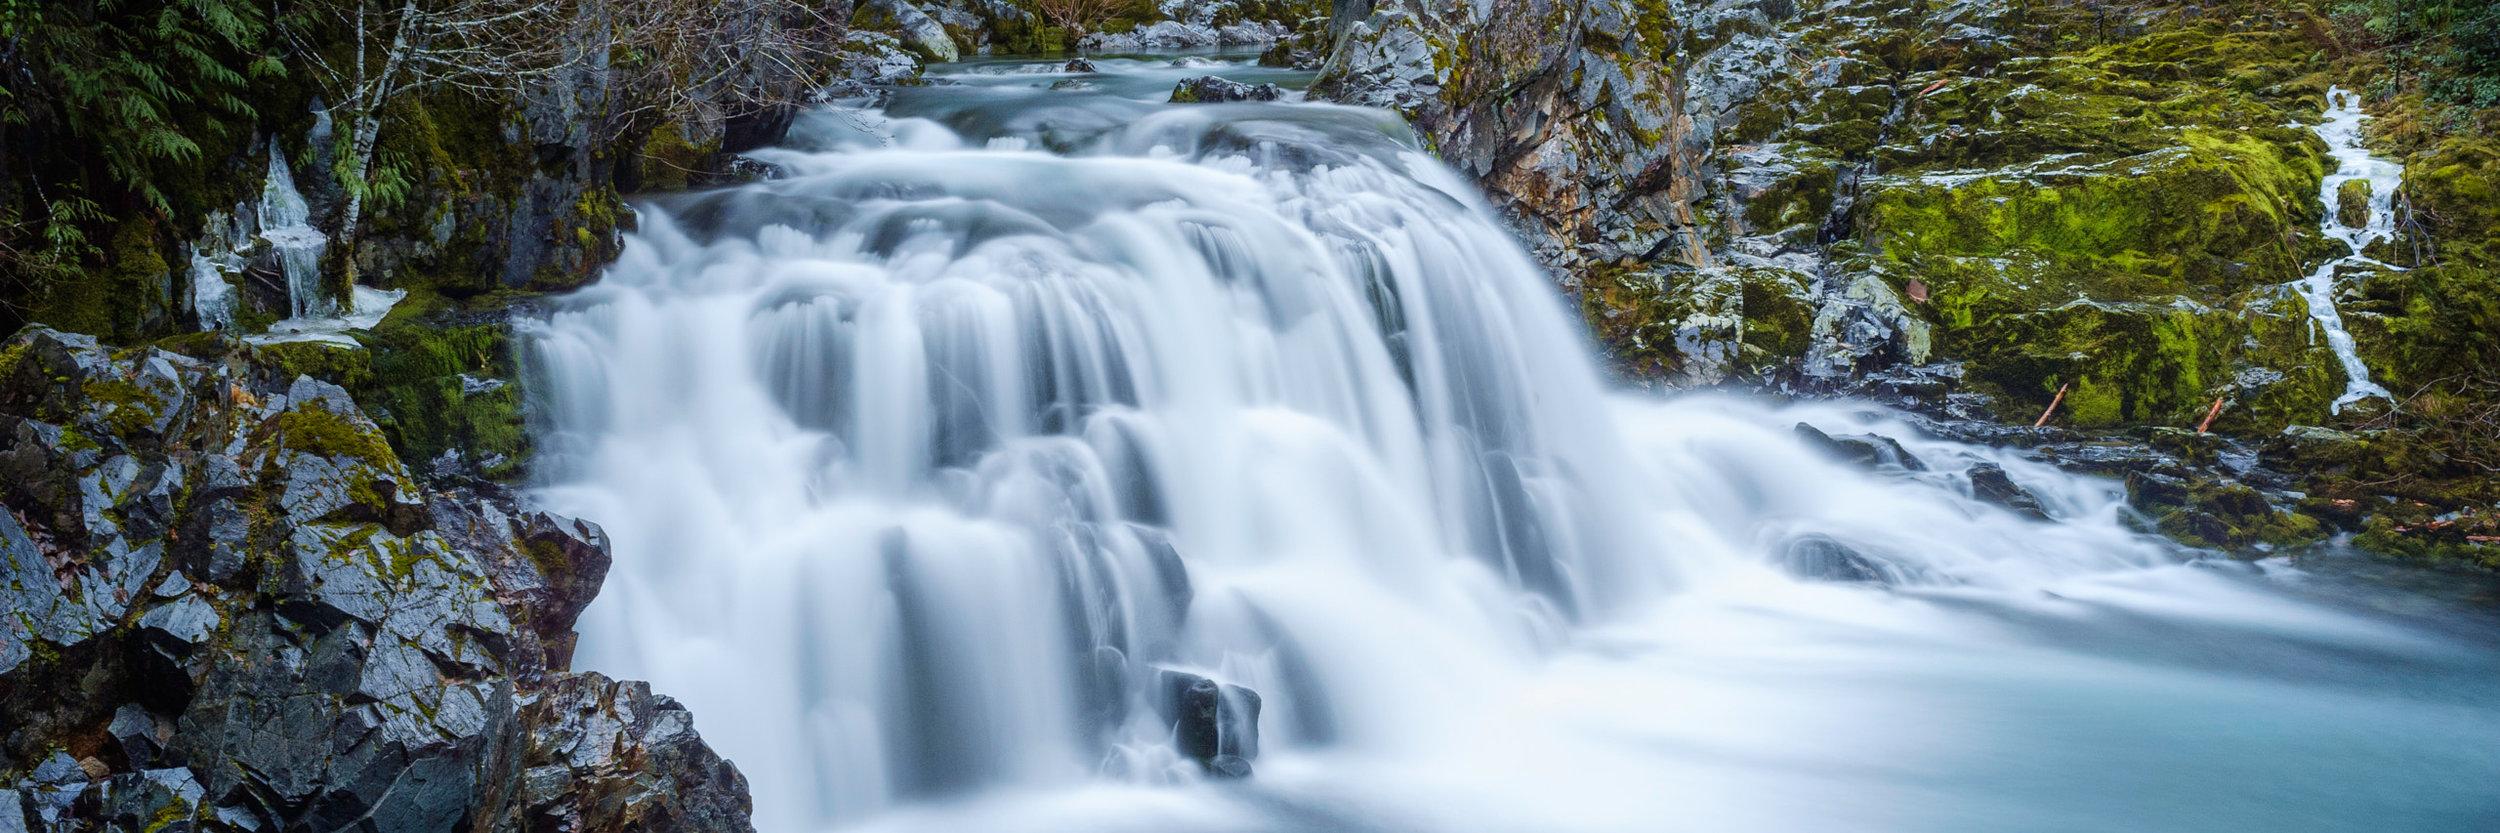 Falls - Opal Creek_2013 - -261-20131230_Opal_Creek_Oregon_0020.jpg